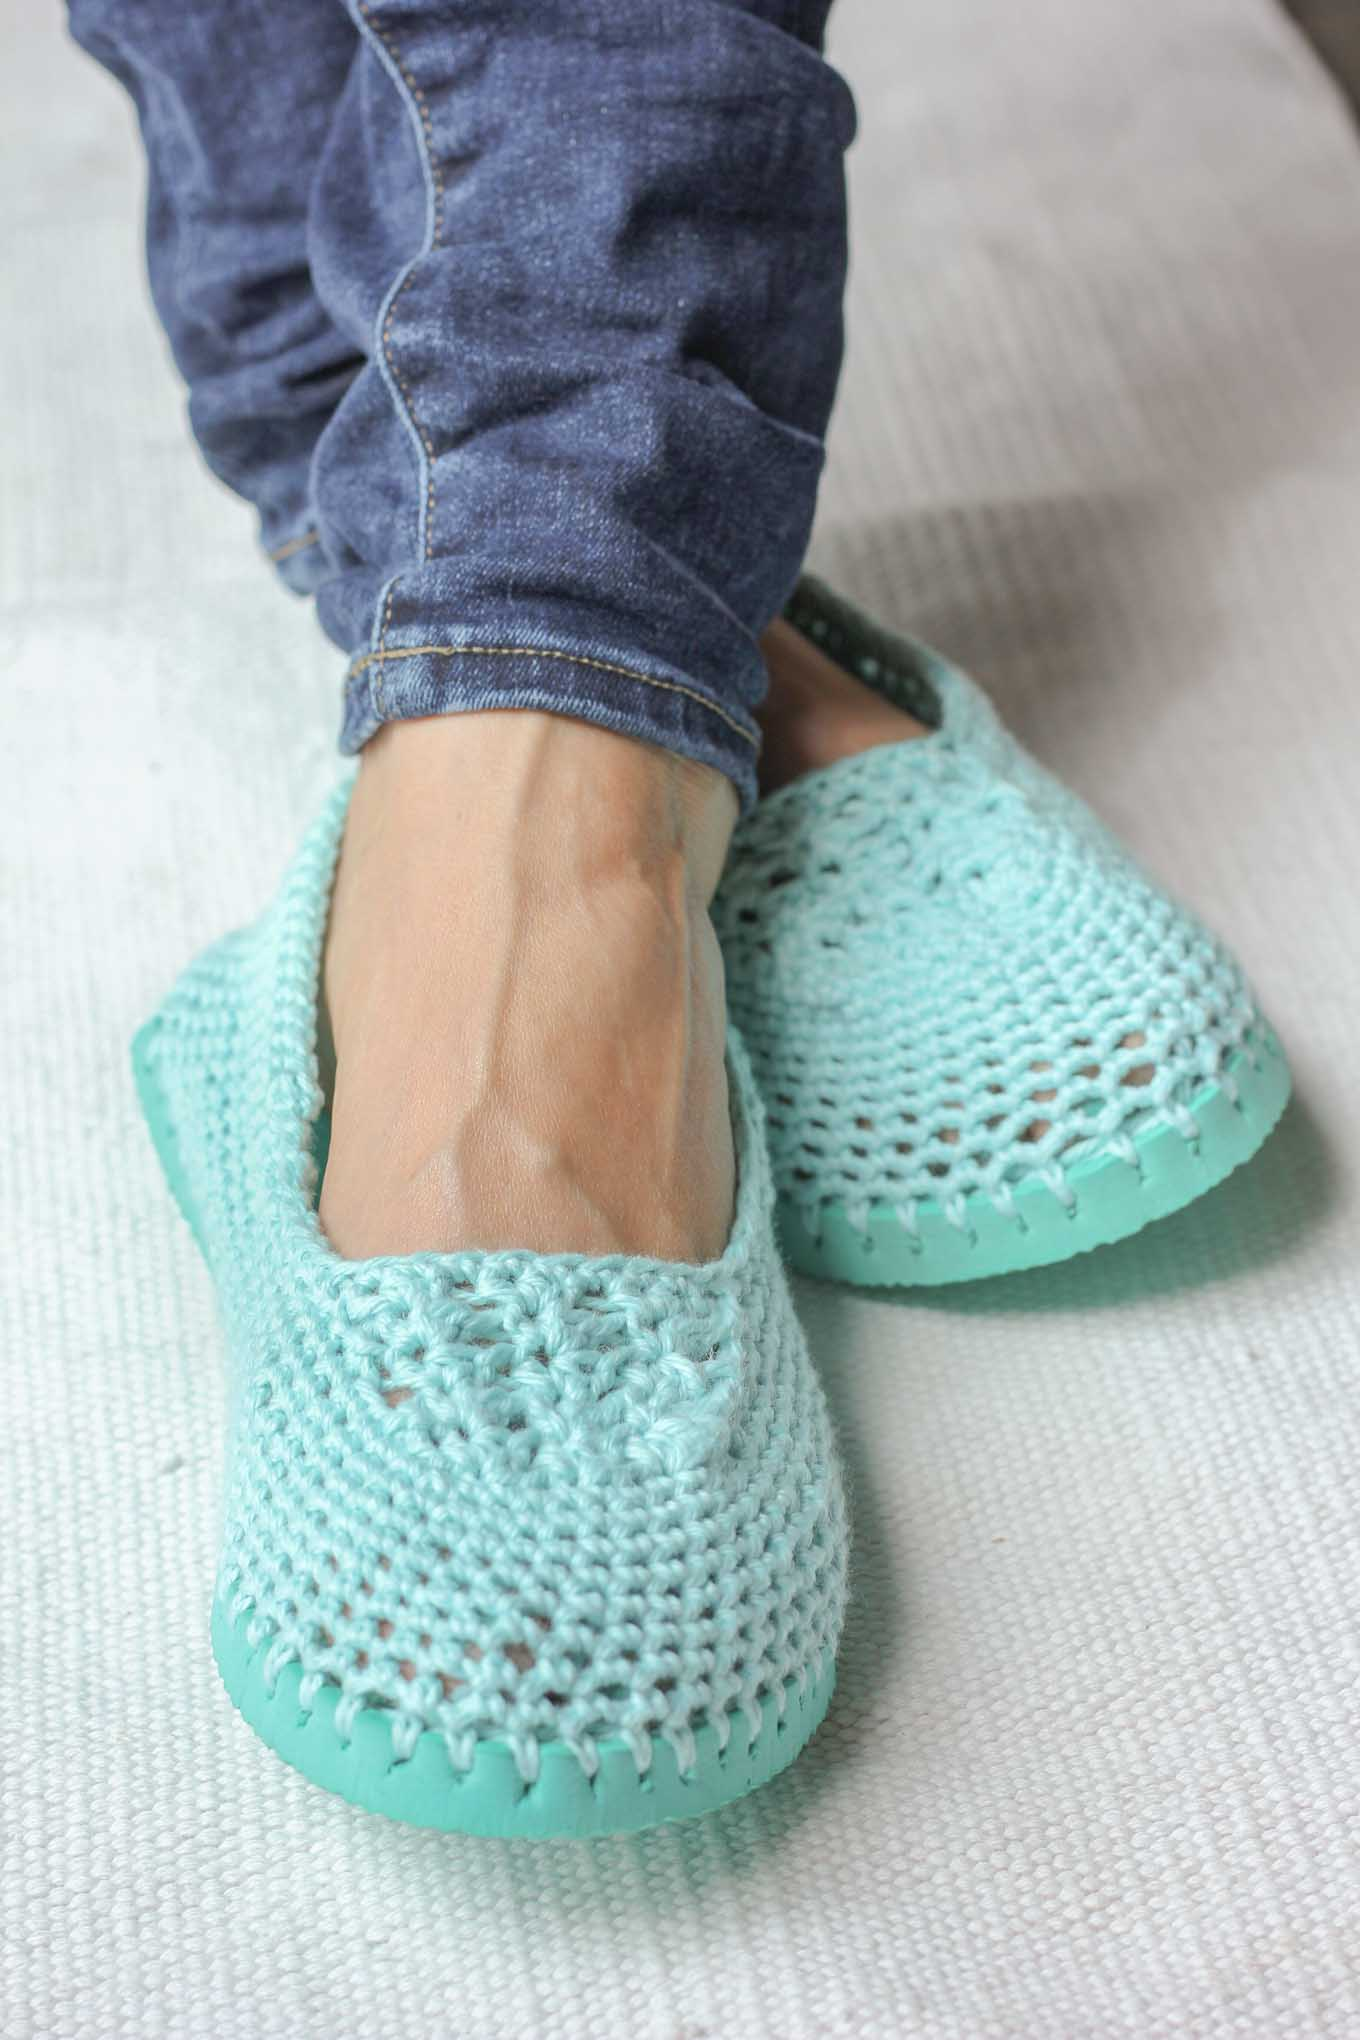 Crochet Shoes make pretty little boots